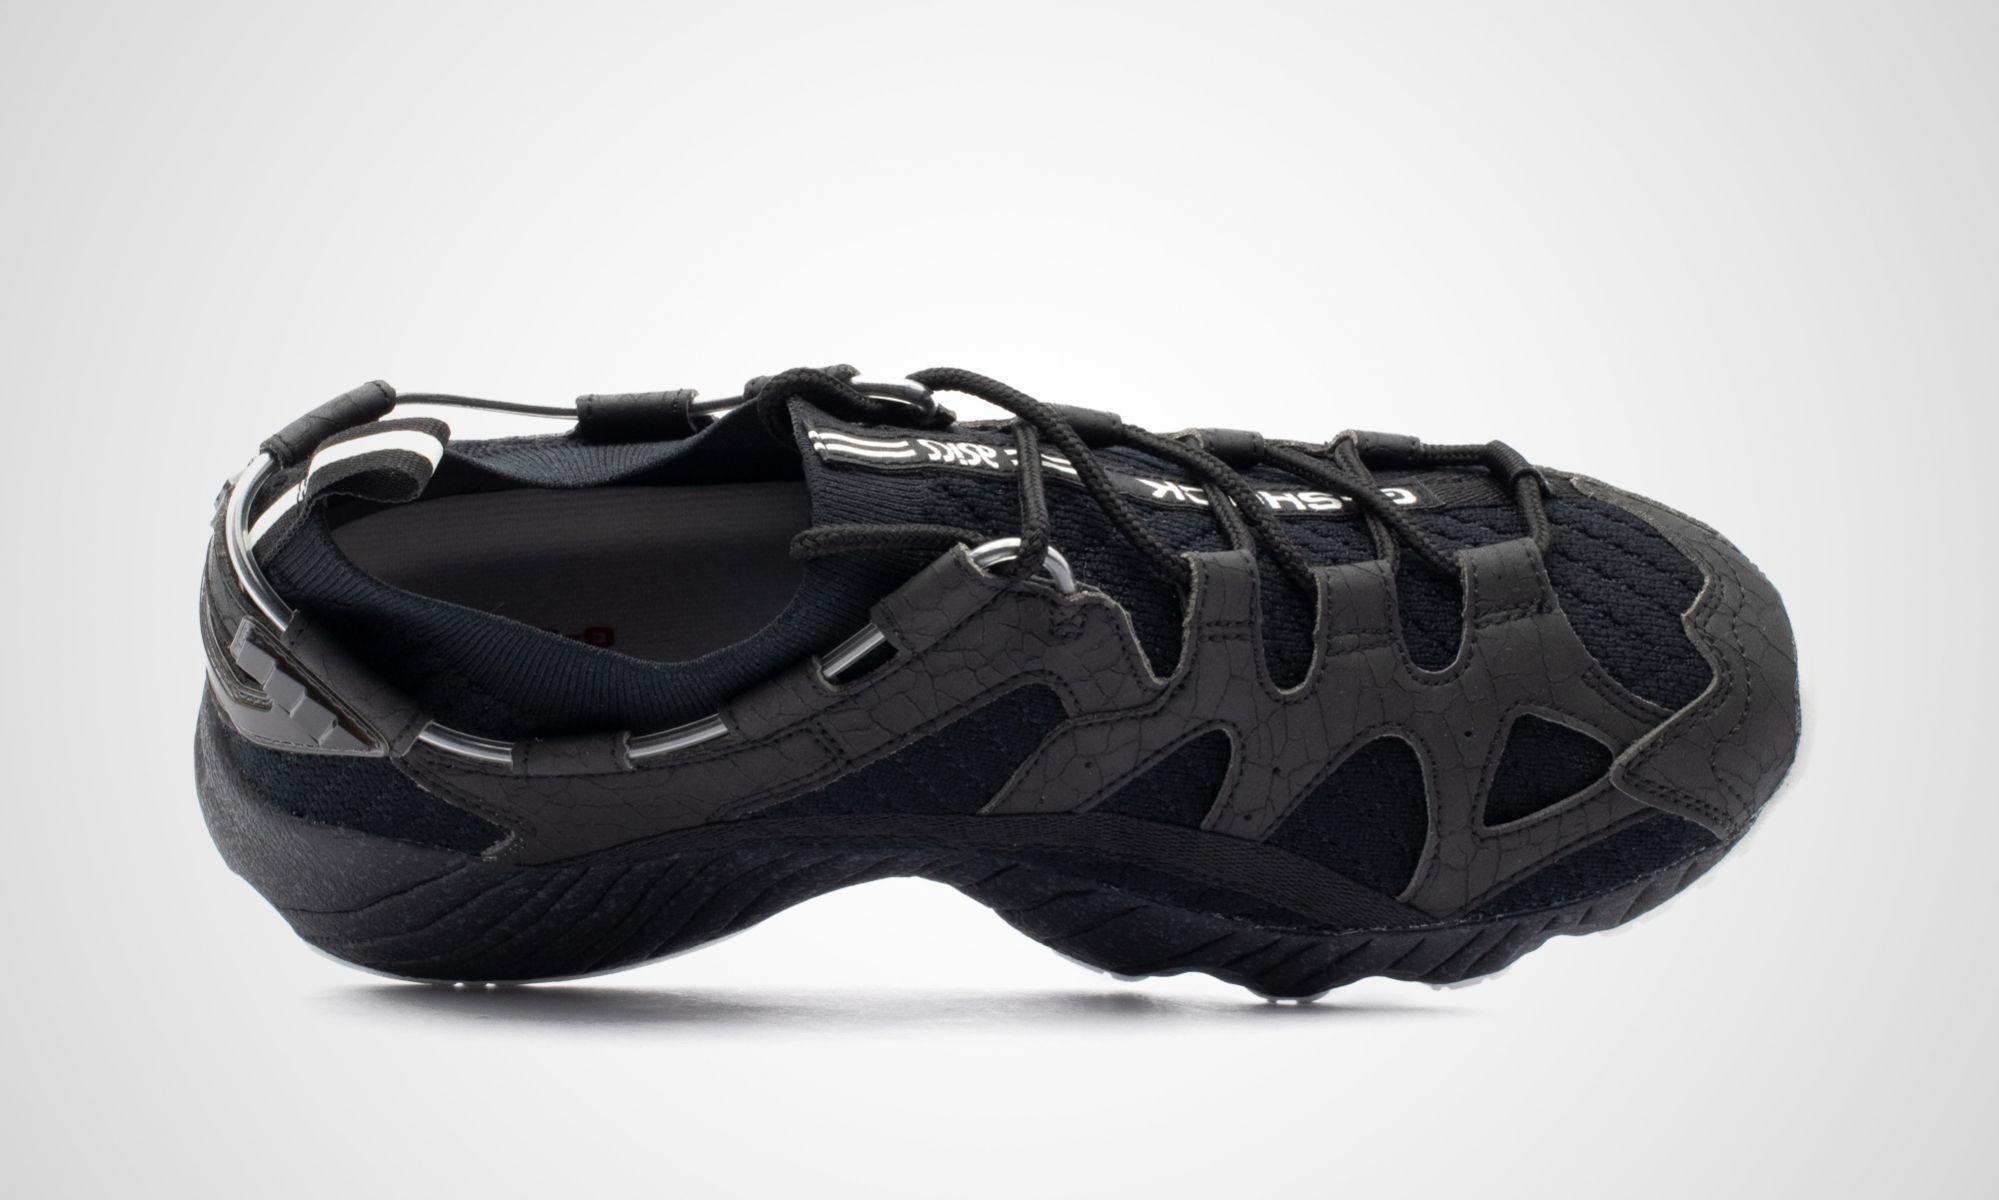 G-Shock x Asics Gel Mai Knit Black (H8P2N-9090)